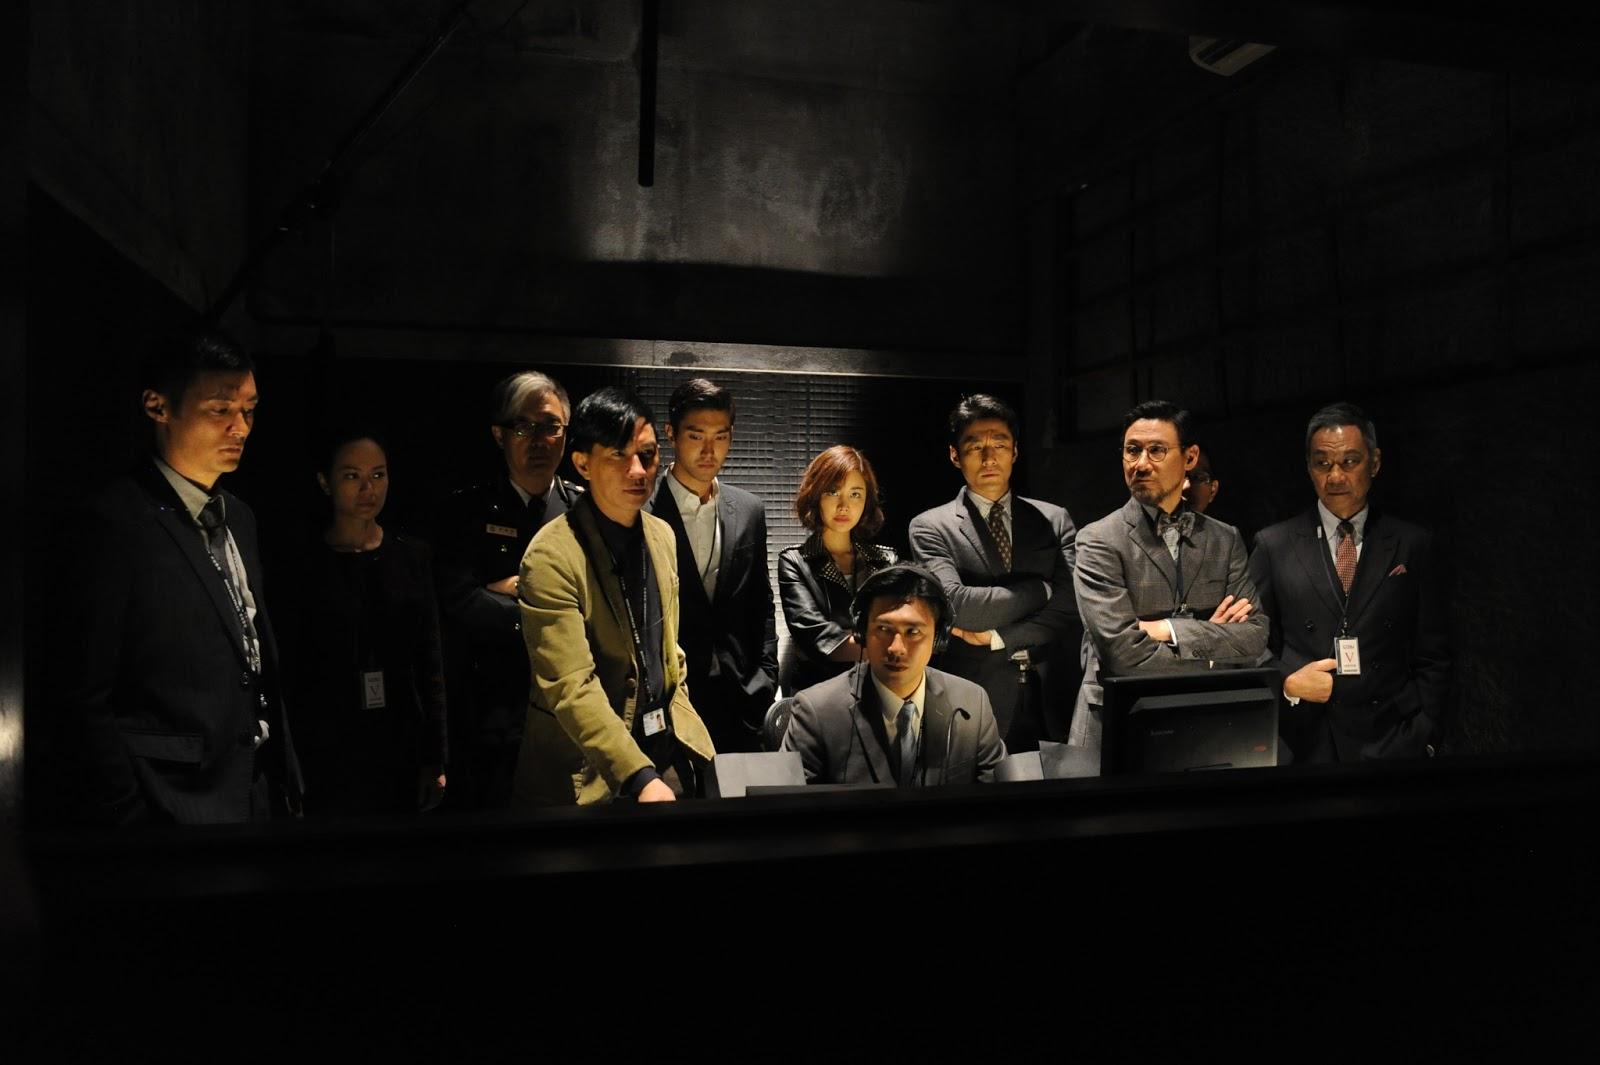 Helios 赤道 Movie Still